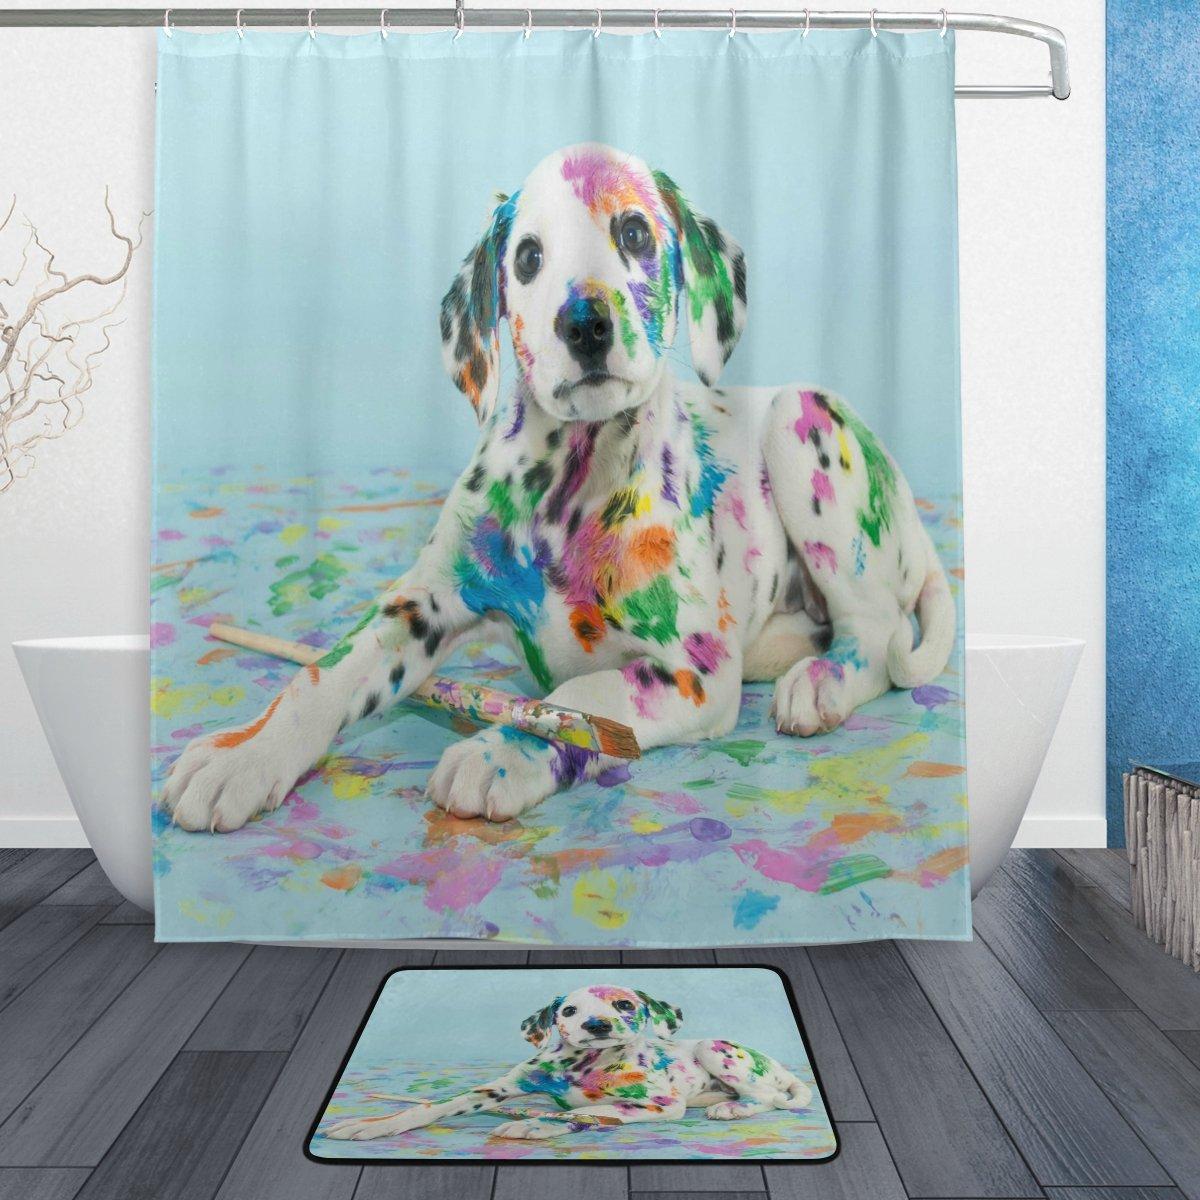 Amazon WOZO Silly Dalmatian Puppy Dog Polyester Fabric Bathroom Shower Curtain 60 X 72 Inch With Hooks Modern Doormat Rug 236 157